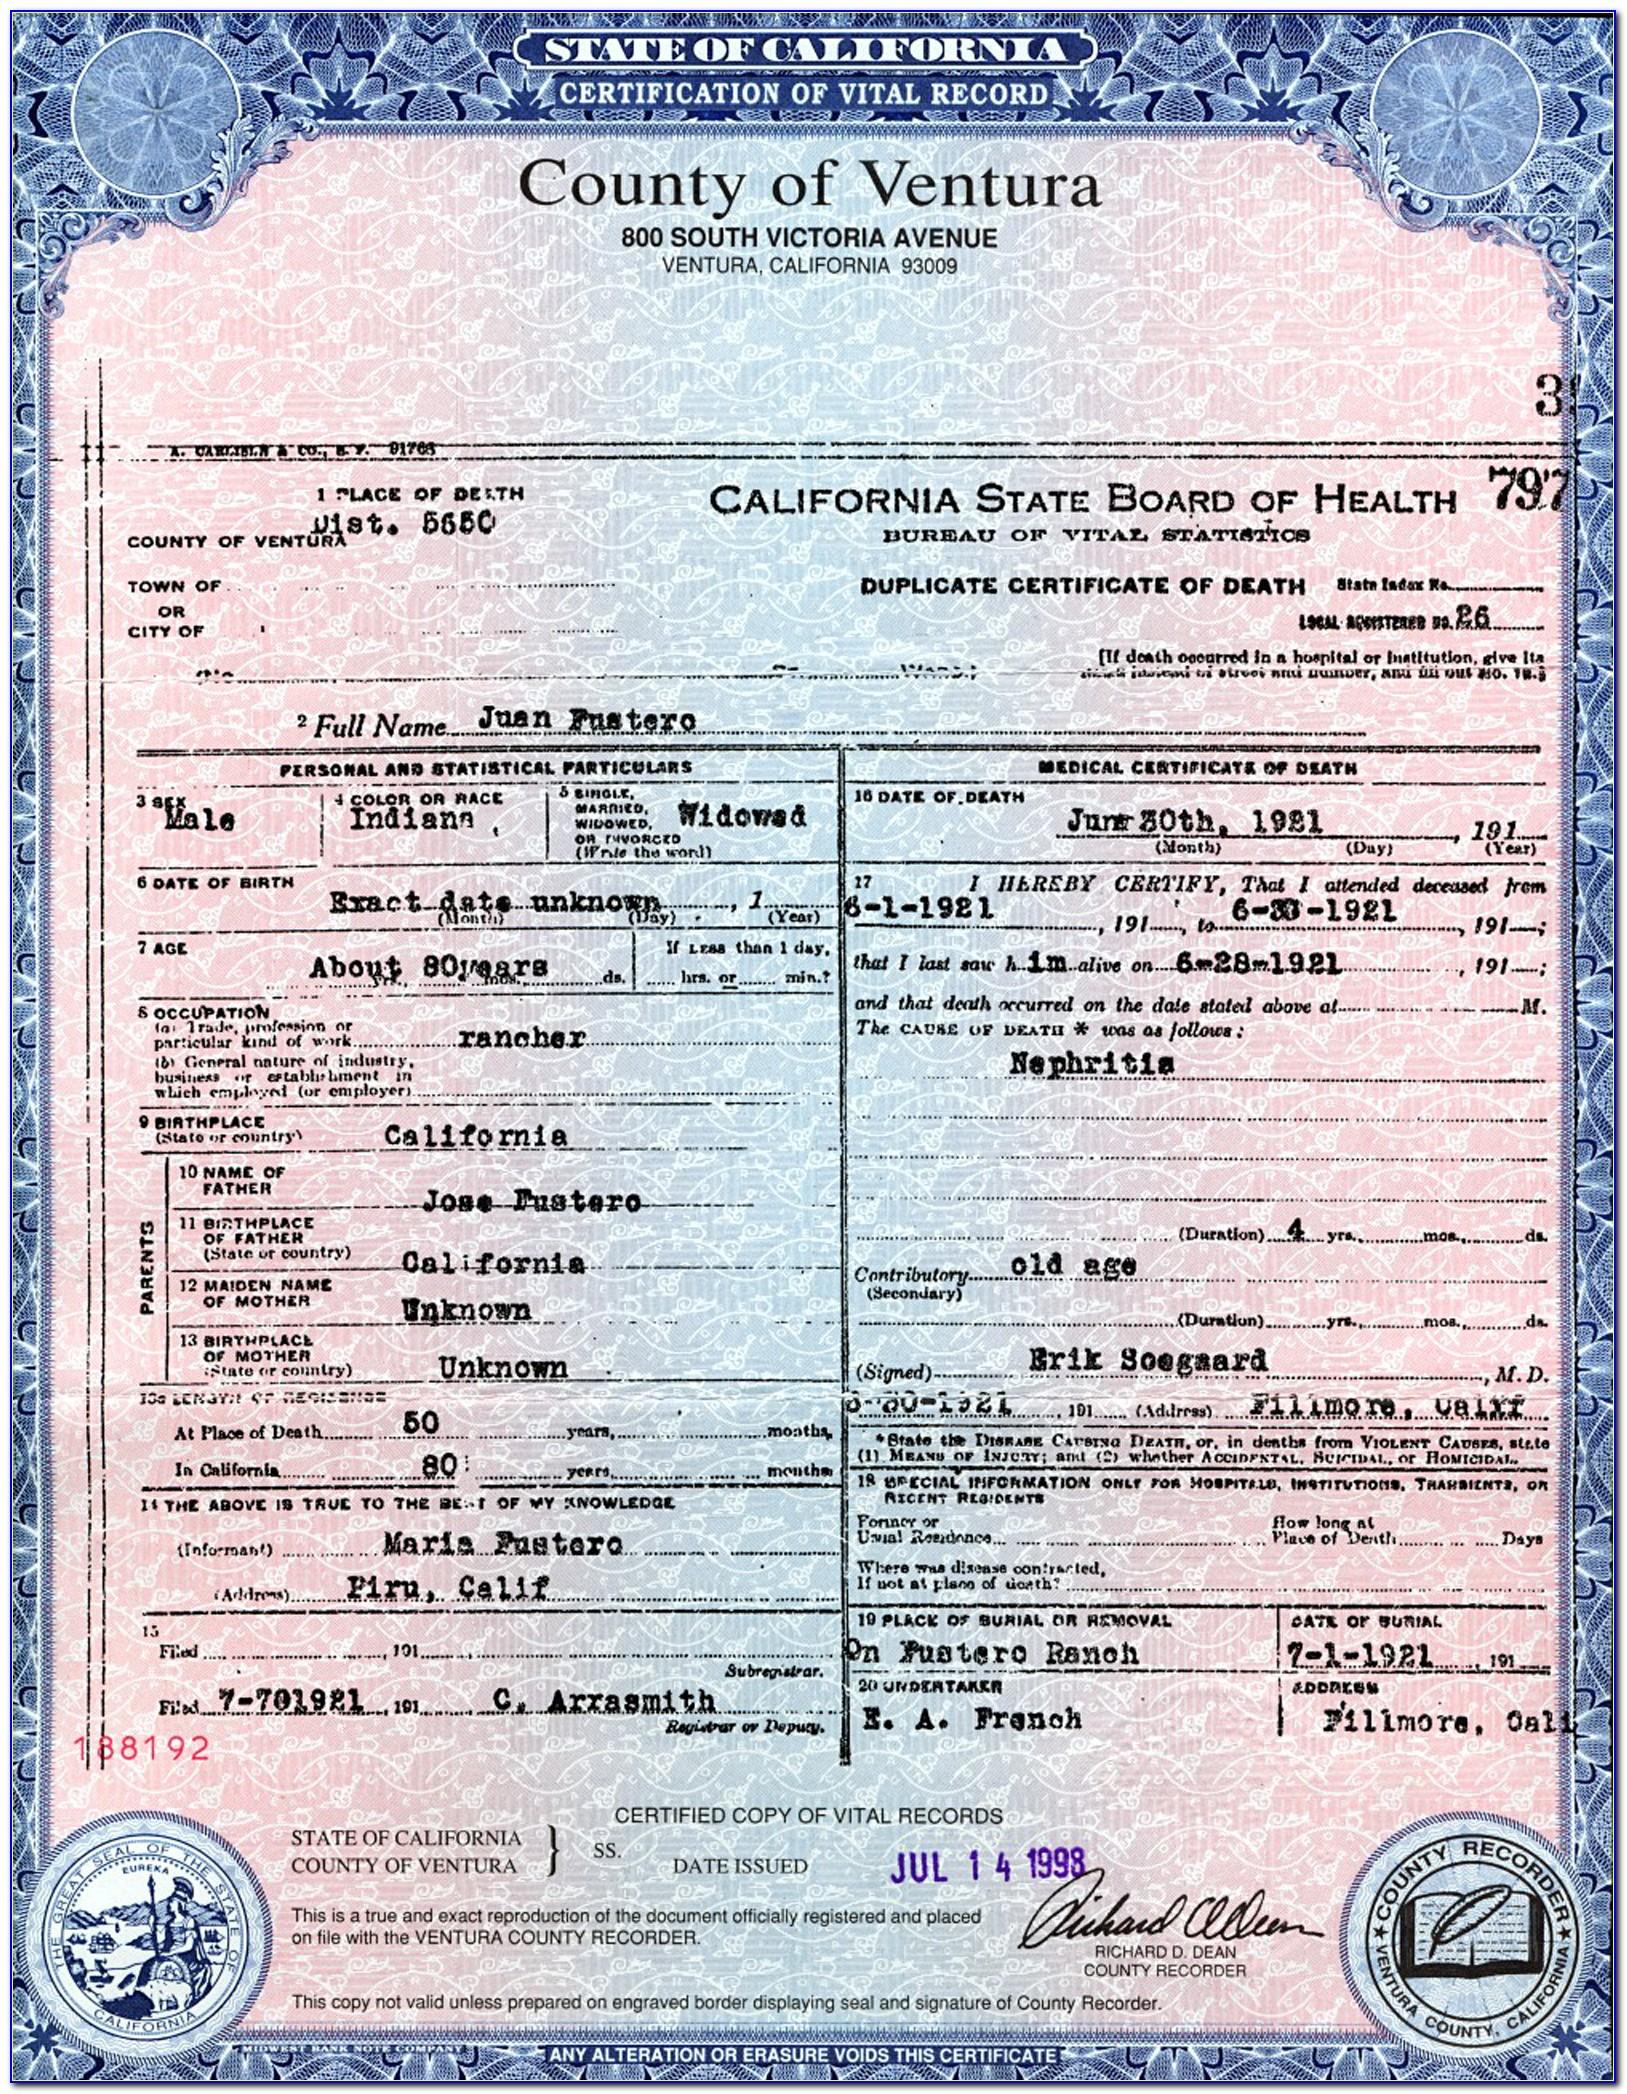 Santa Clara County Birth Certificate Apostille